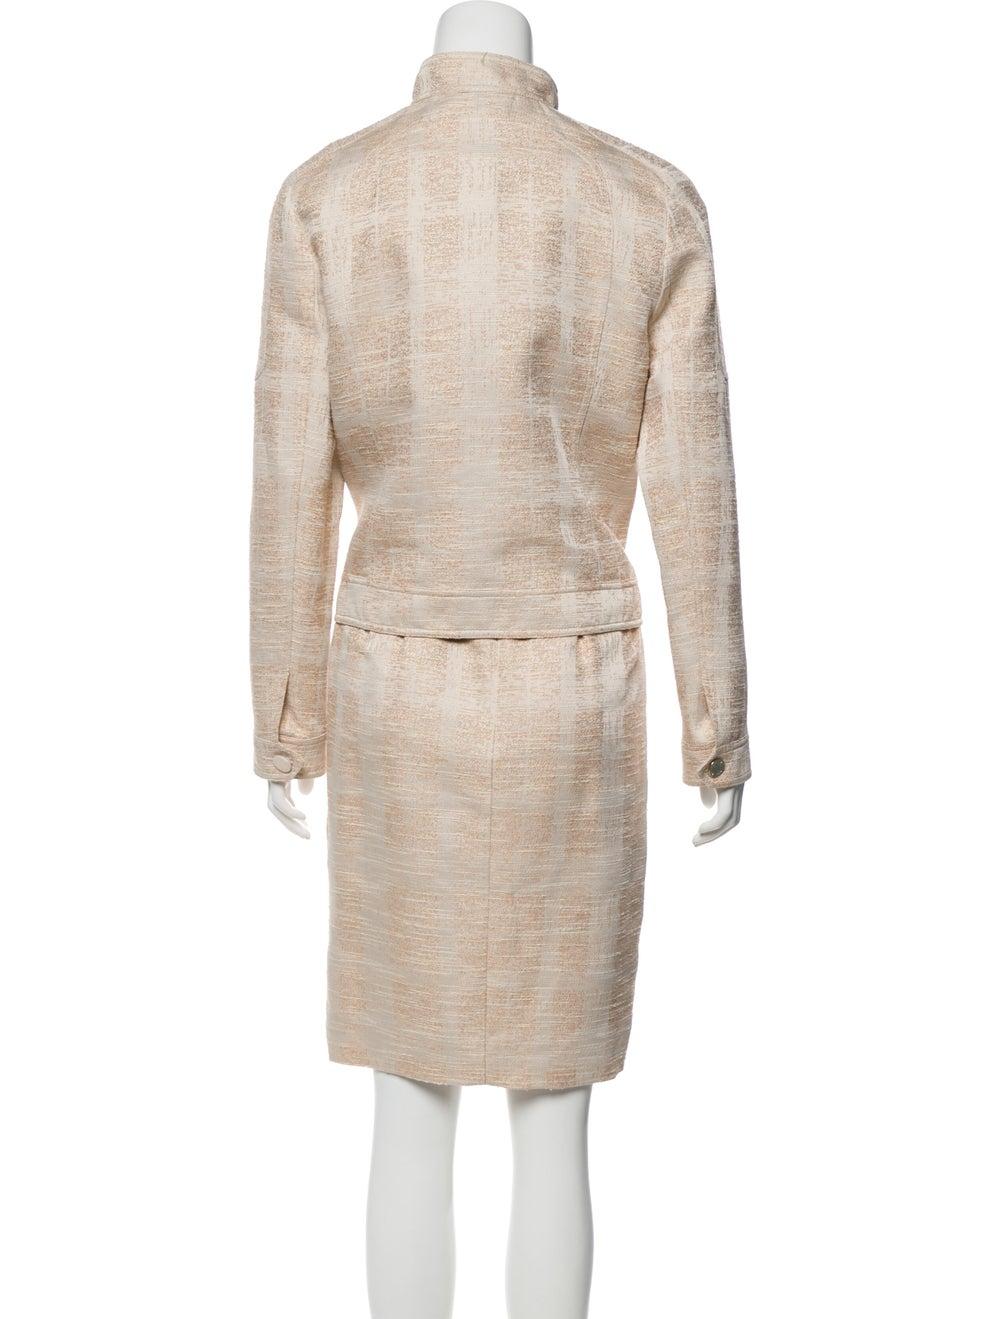 Tory Burch Tweed Pattern Dress Set - image 3